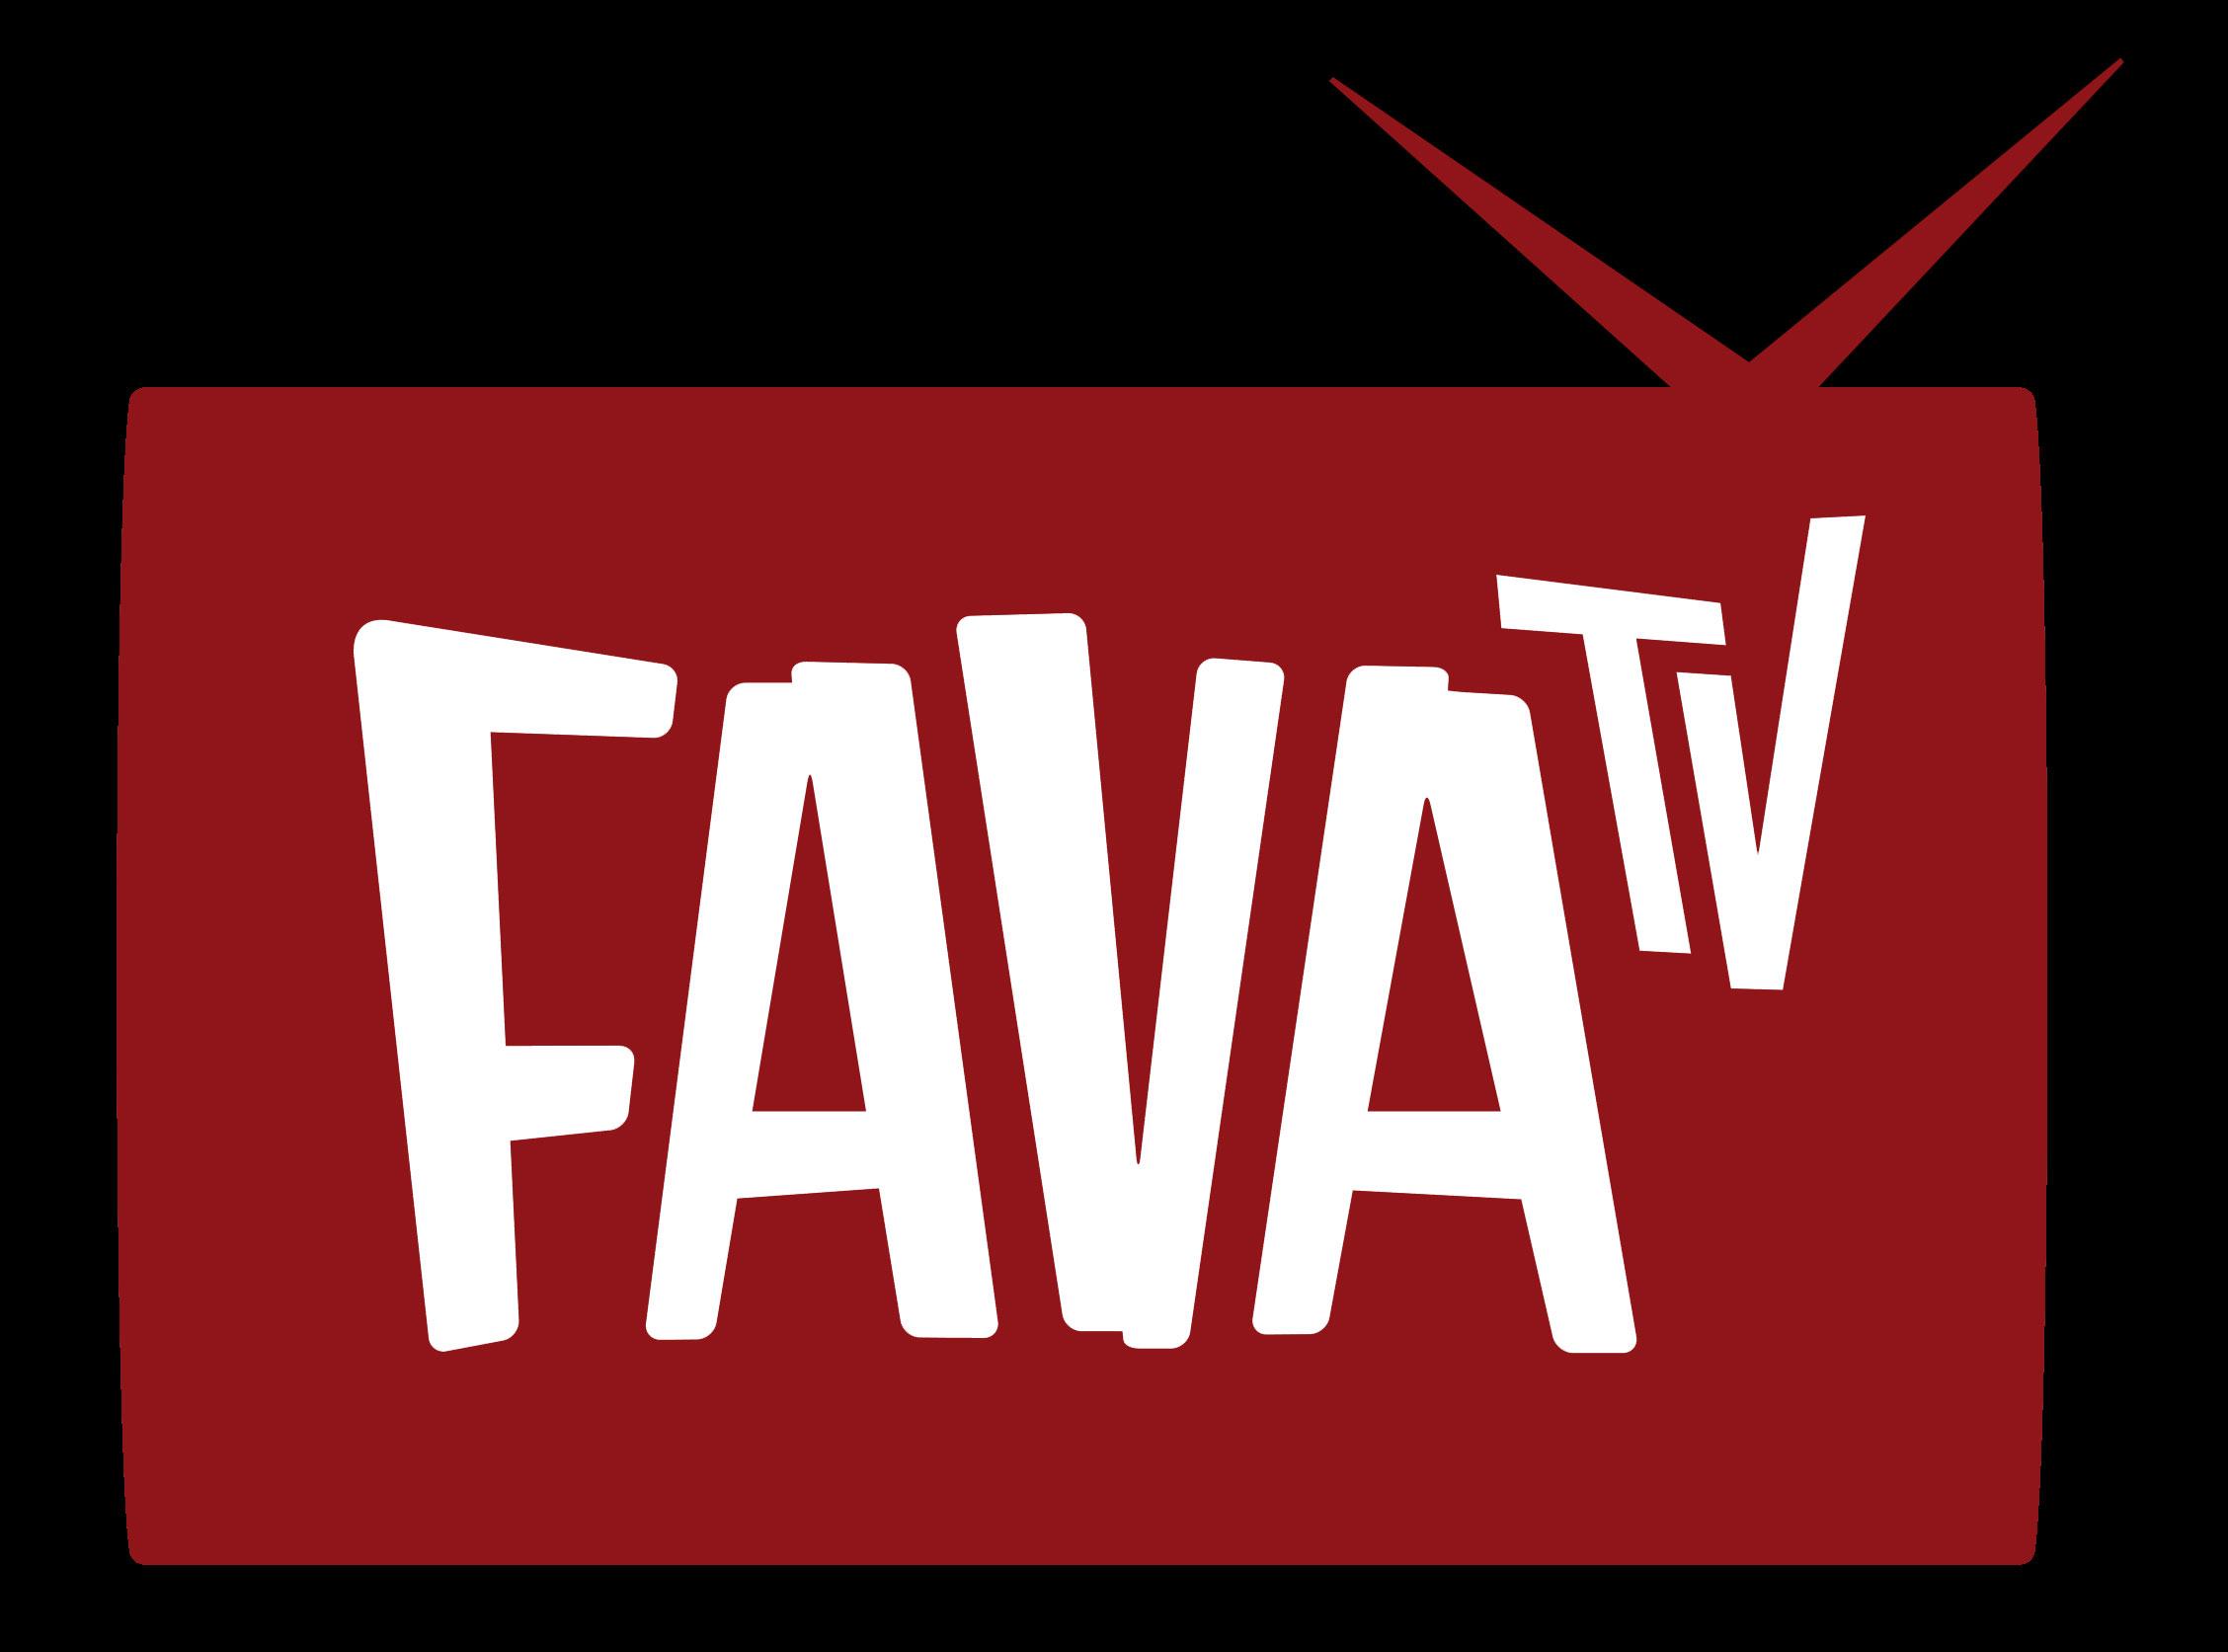 FAVATV-Logo-Inverse.jpg